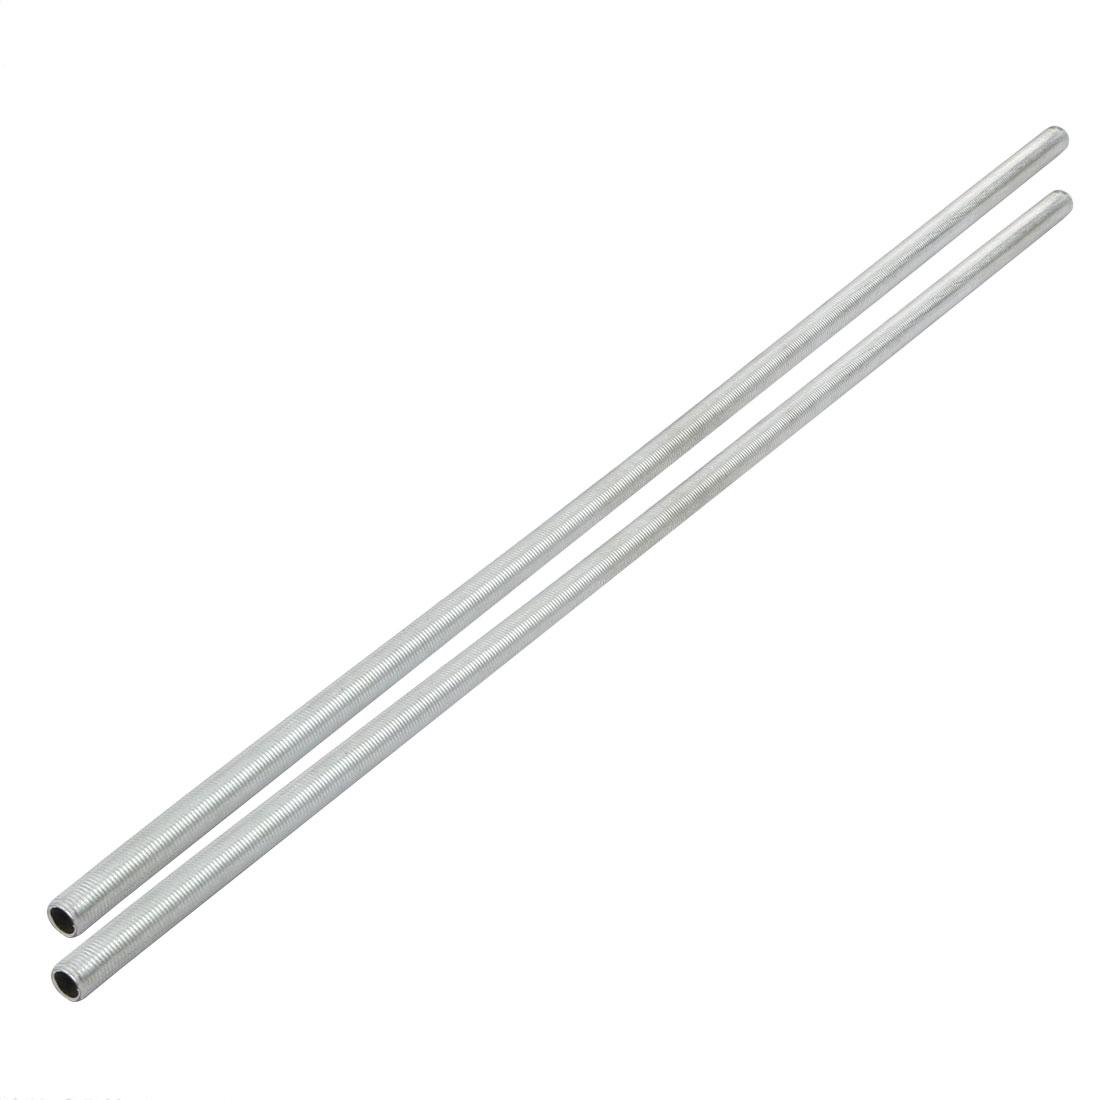 2pcs Metric M10 1mm Pitch Thread Zinc Plated Pipe Nipple Lamp Parts 47cm Long